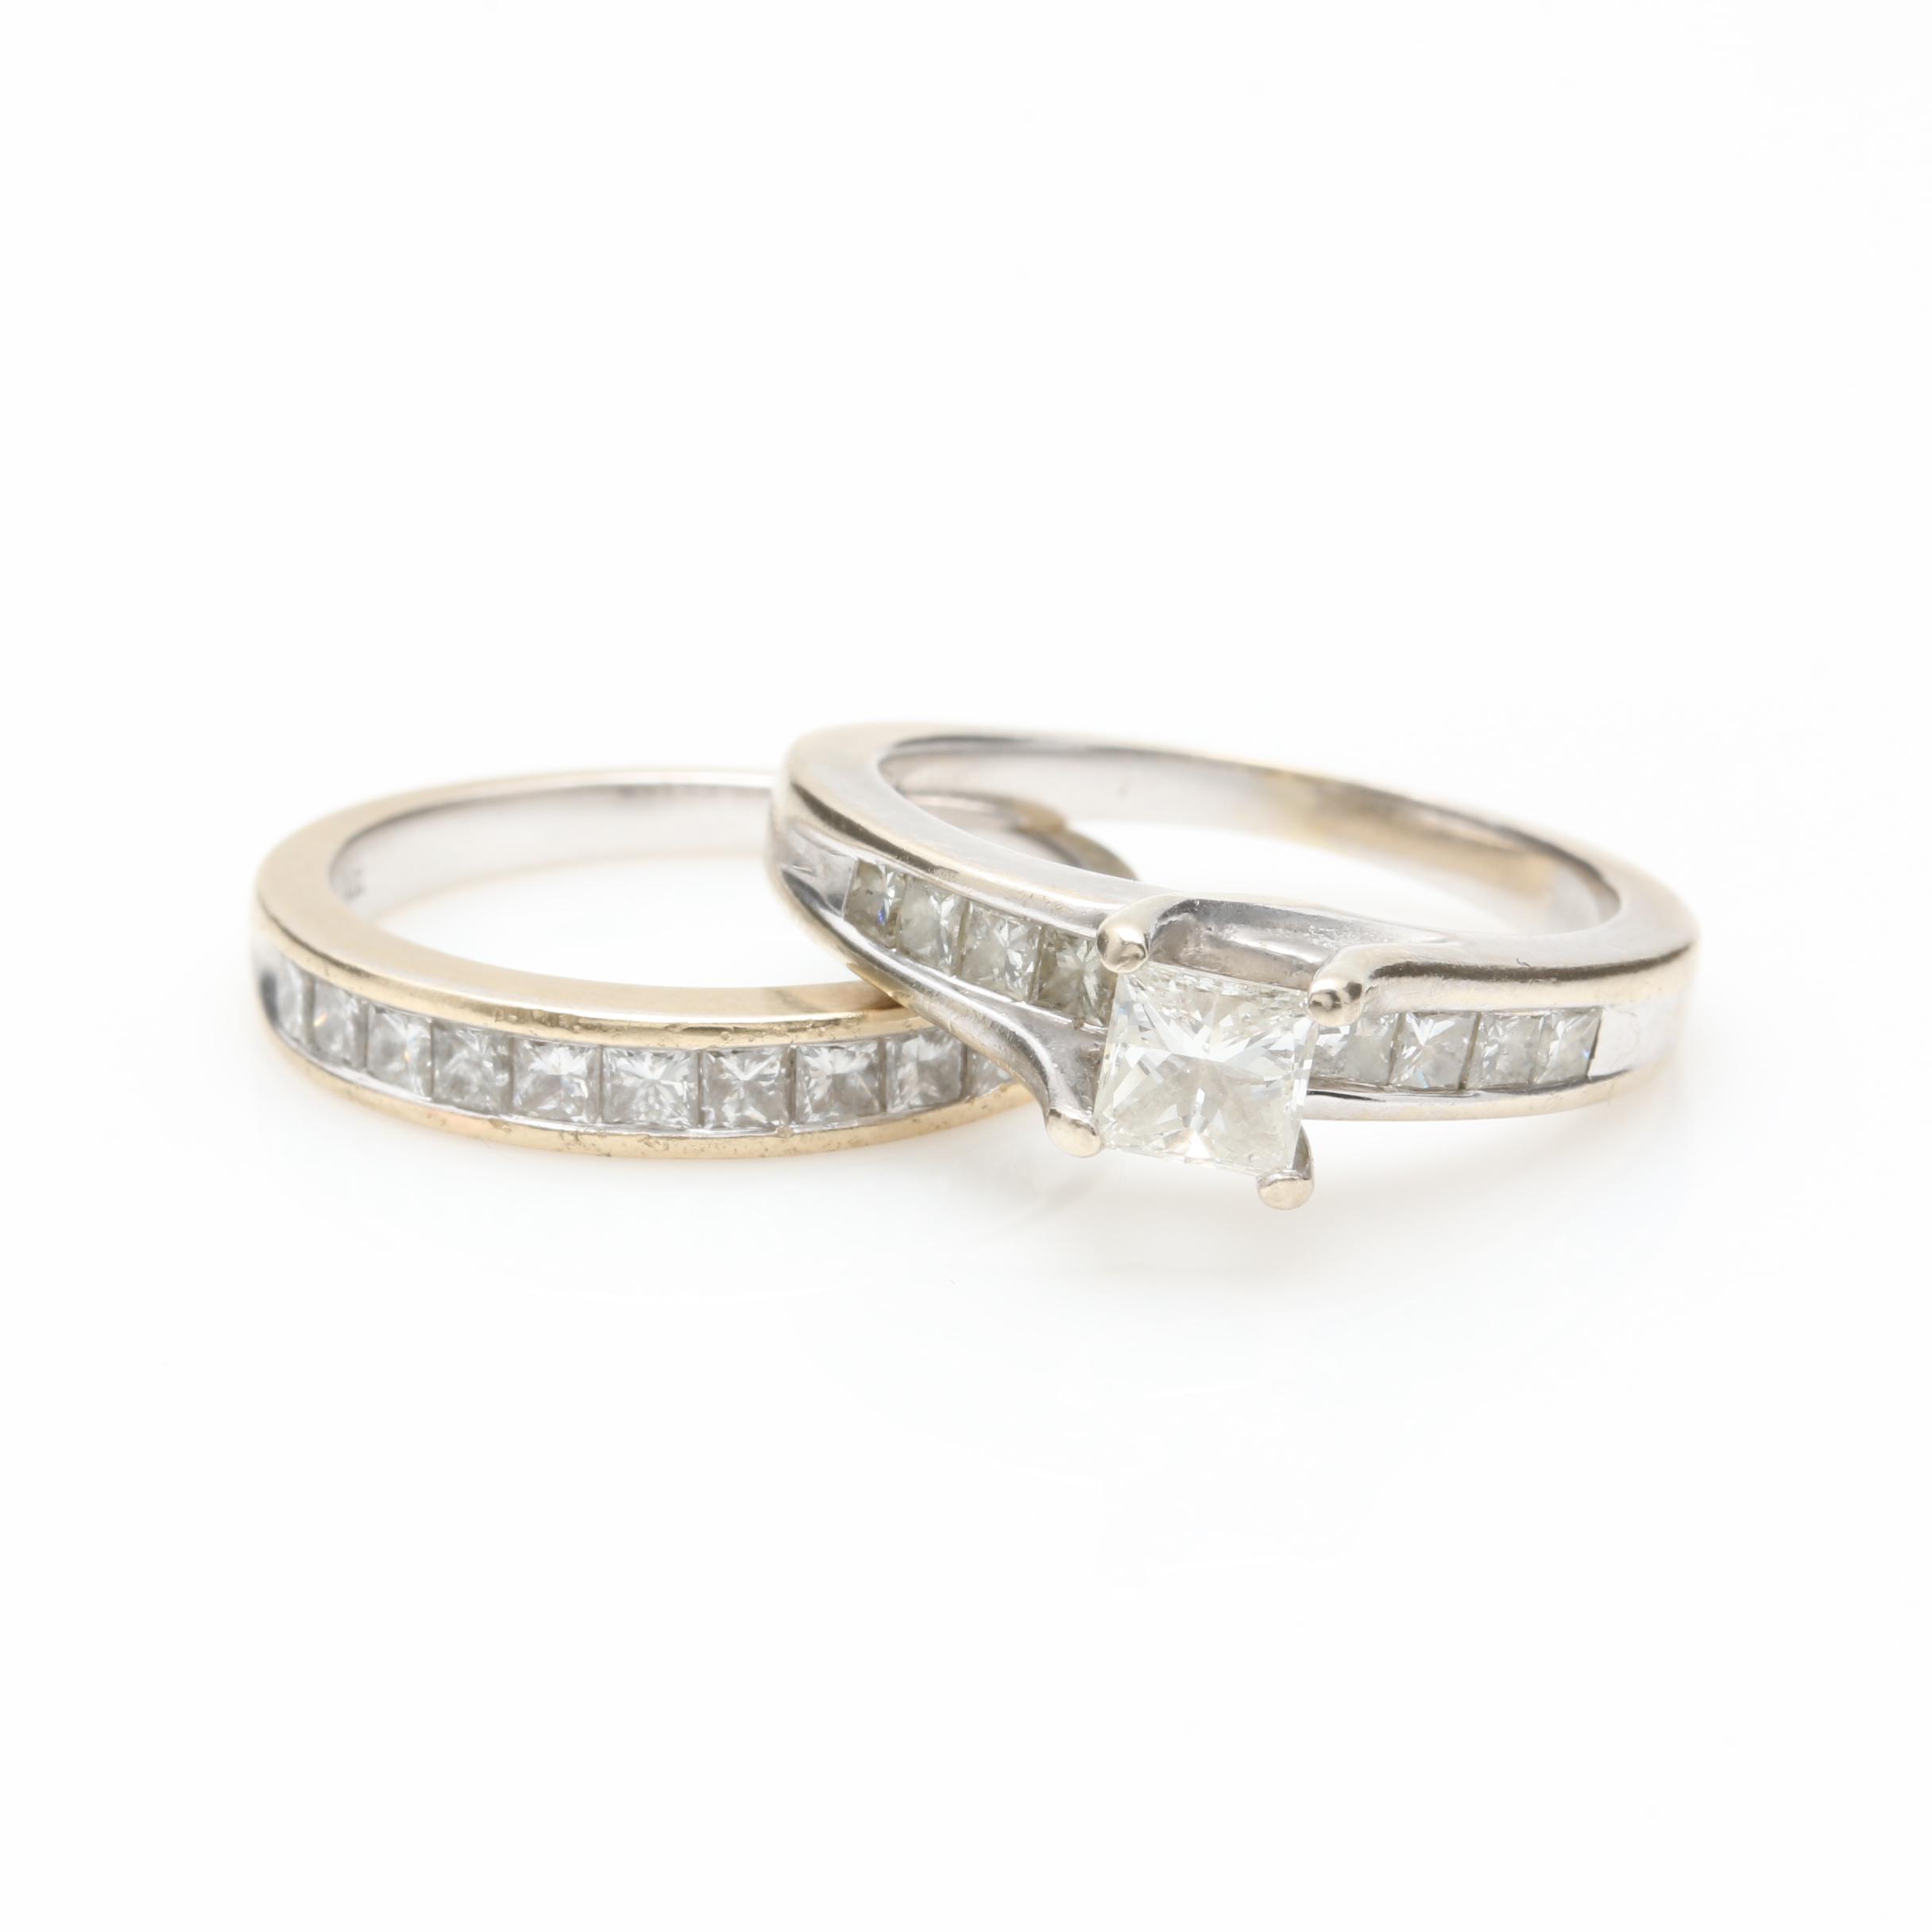 14K and 18K White Gold 1.50 CTW Diamond Ring Set